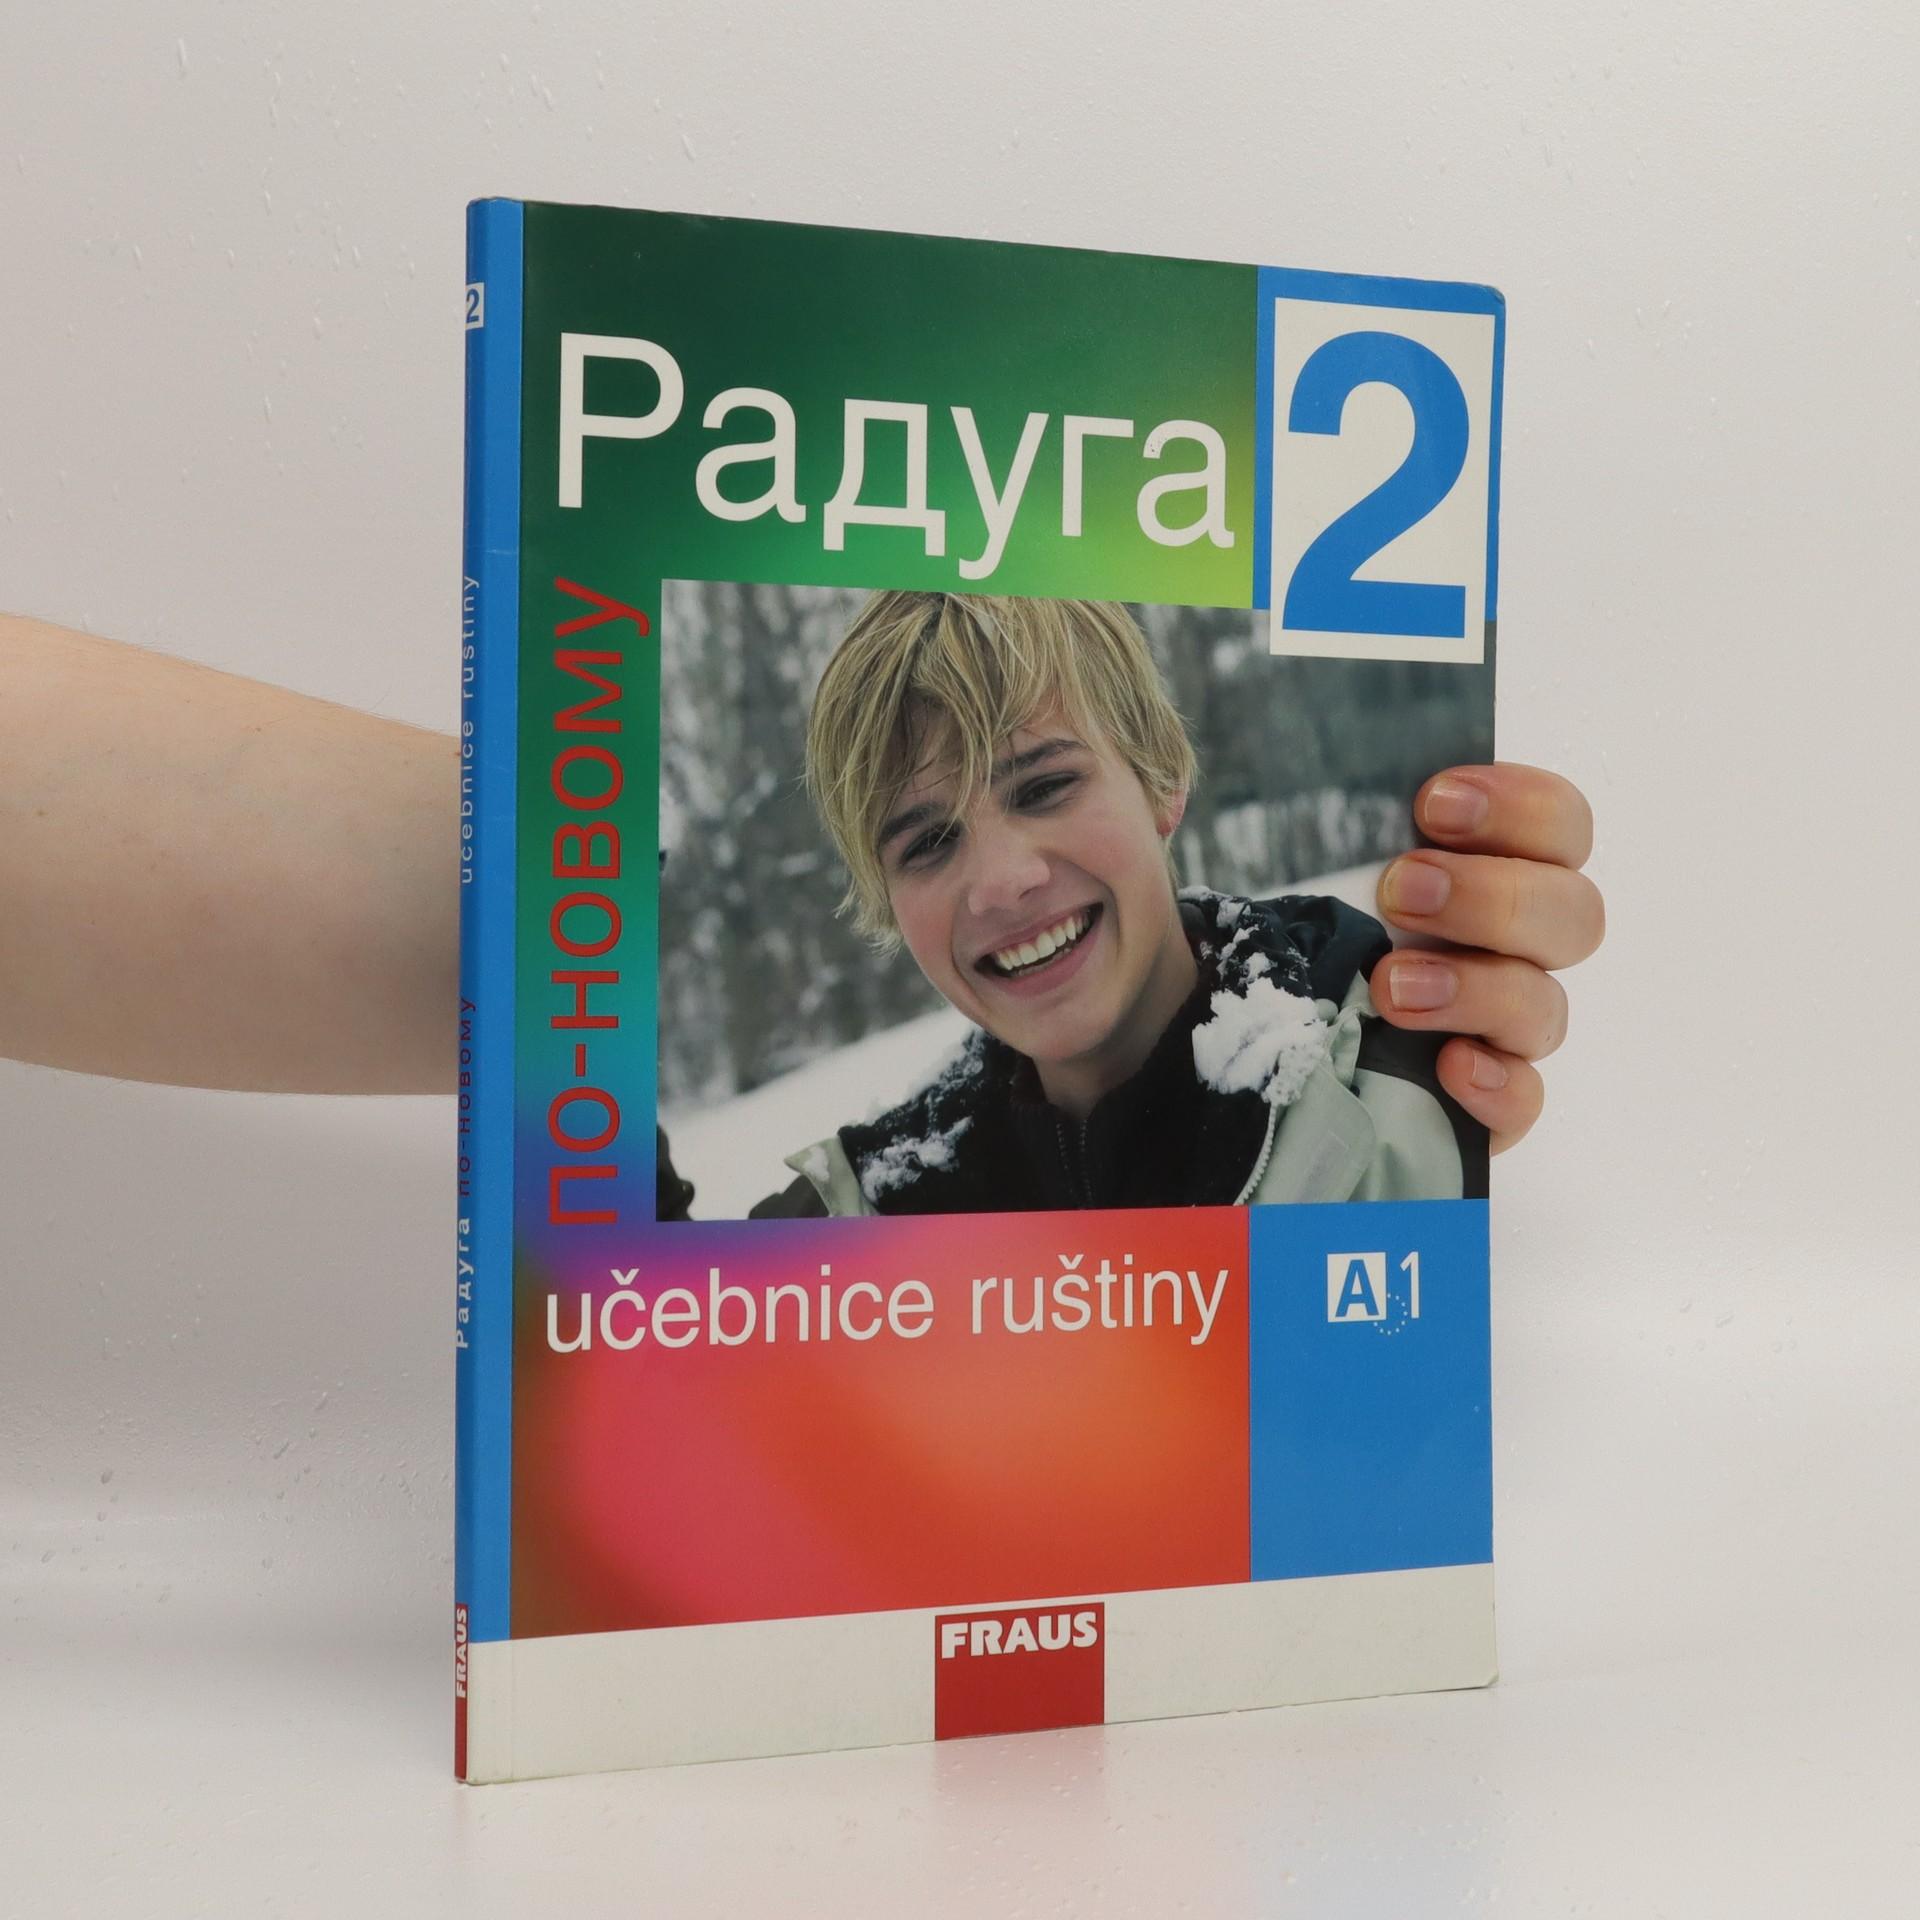 antikvární kniha Raduga : po-novomu : učebnice ruštiny, 2008